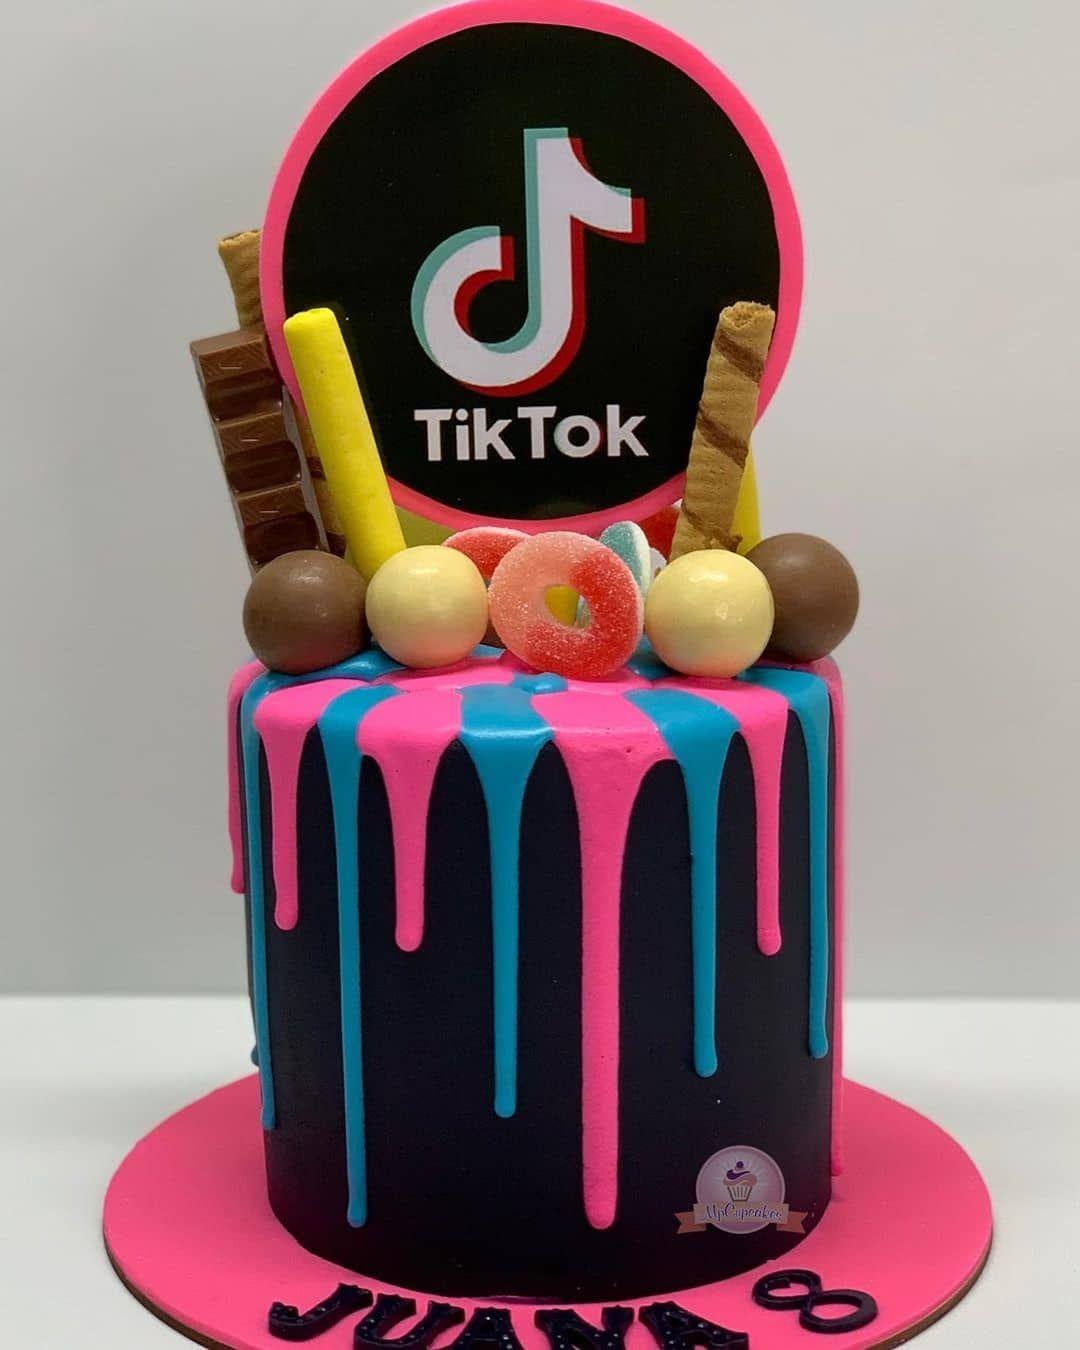 13 Cute Tik Tok Cake Ideas Some Are Absolutely Beautiful 14th Birthday Cakes Unique Birthday Cakes 13 Birthday Cake